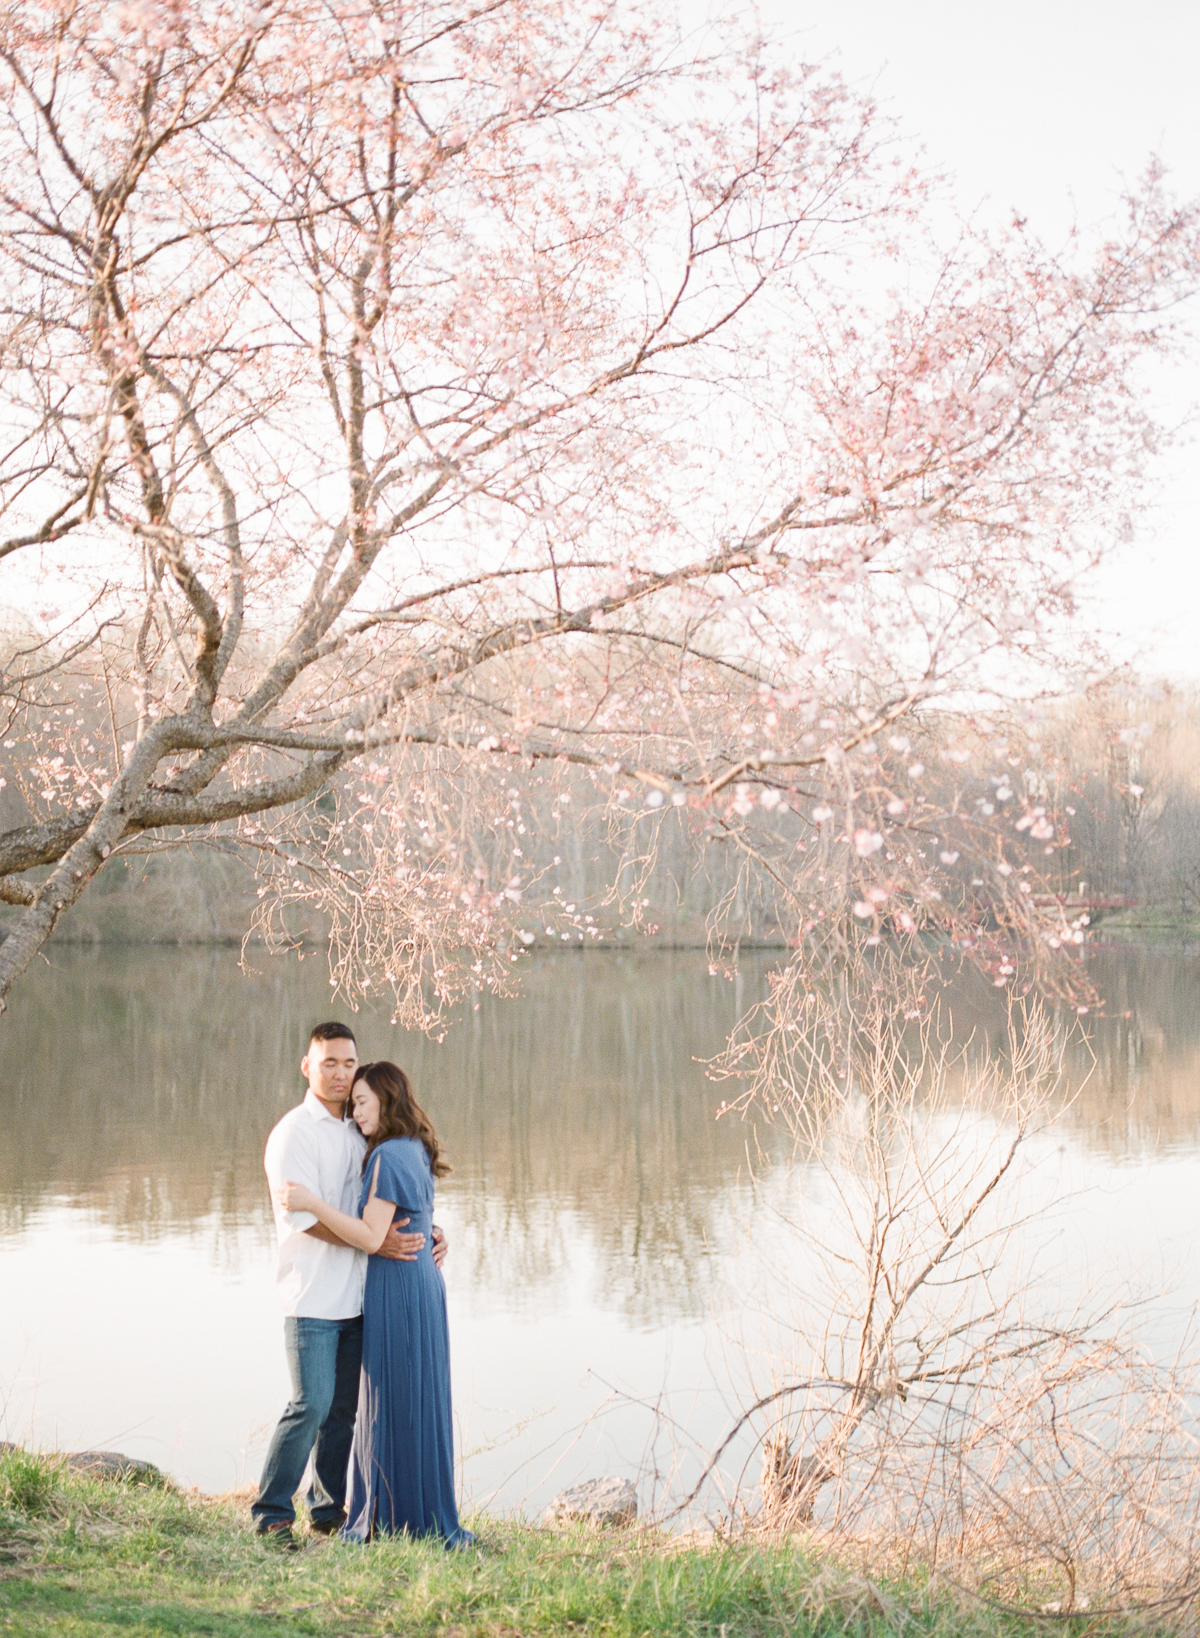 MD-Engagement-Spring-Ellicott-City-Centennial-Park-2.jpg